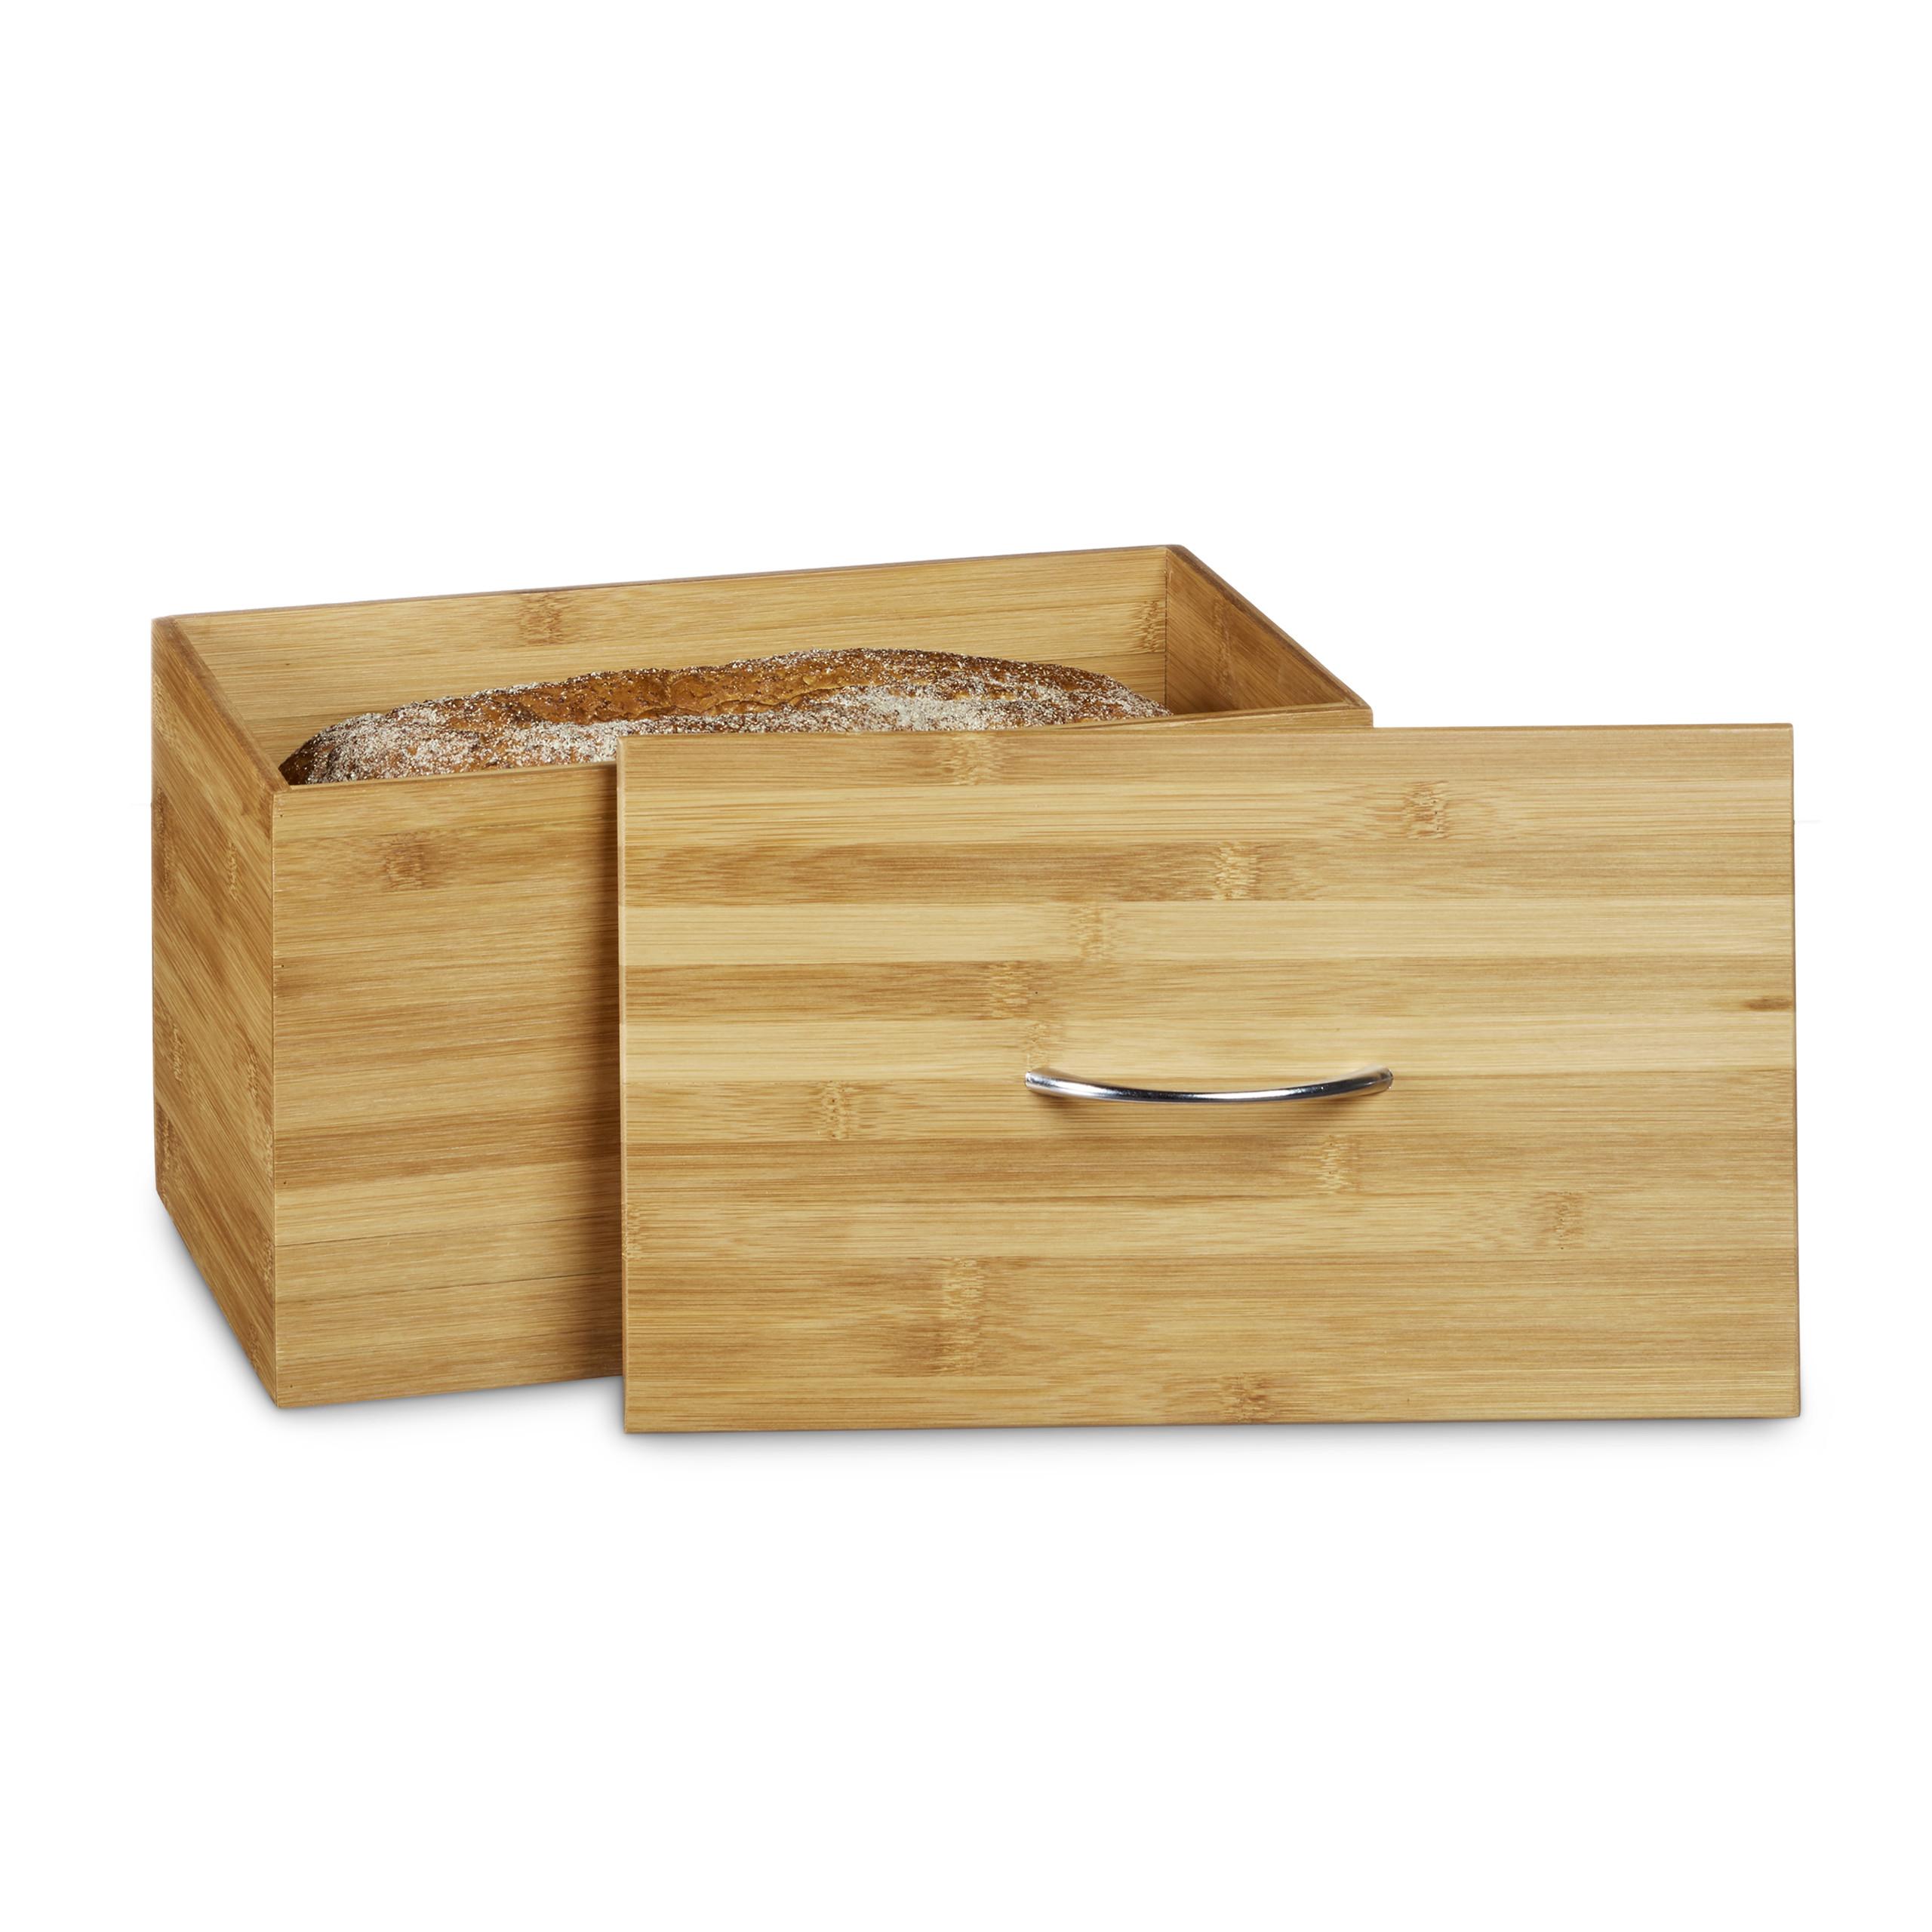 Brotkasten Bambus Brottopf Brotbehälter Brotkiste Brotbox Brotbehälter Brot Dose